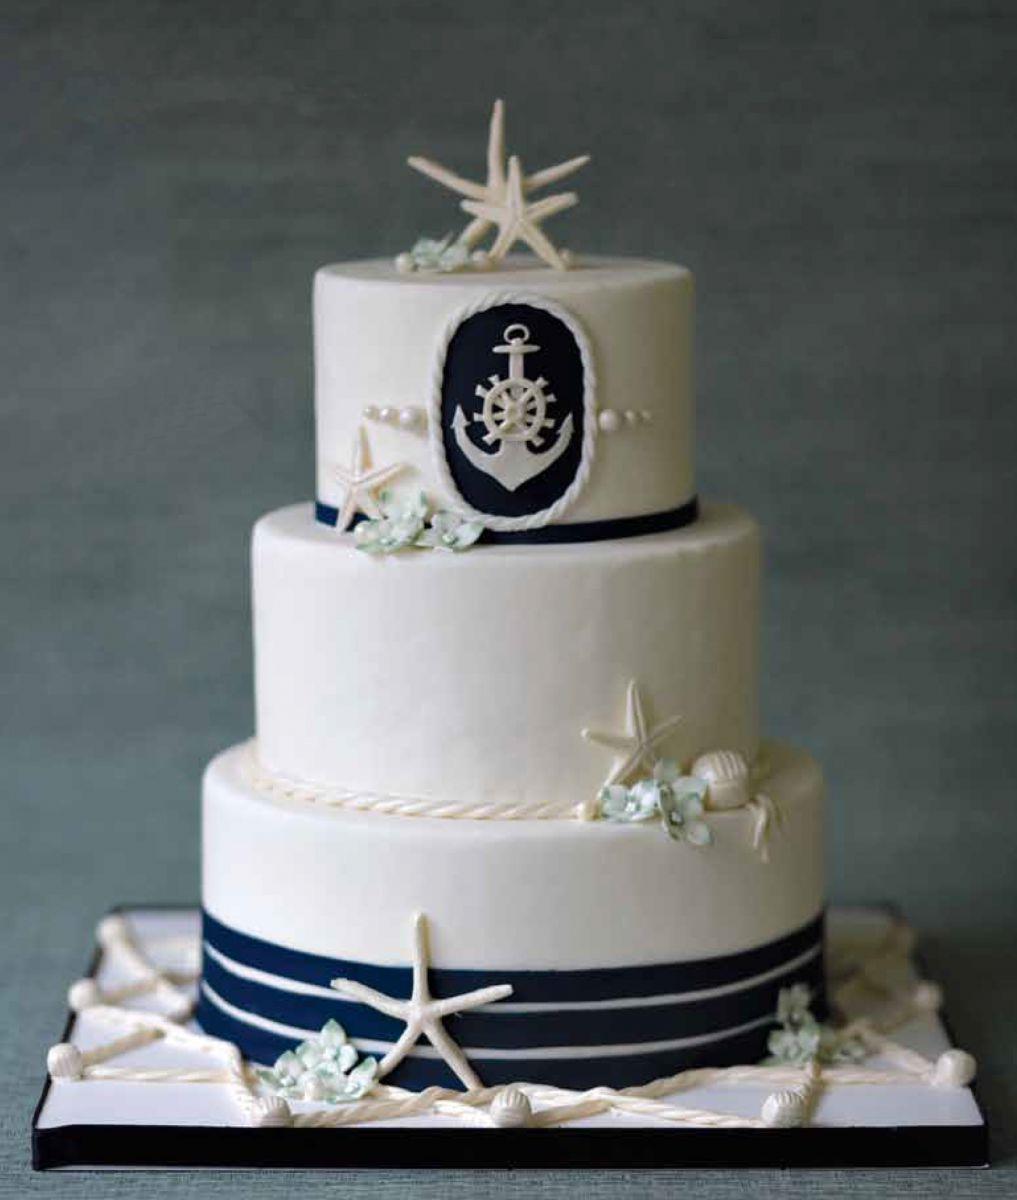 Nautical wedding cake lie the starfish on it but not the navy blue nautical wedding cake lie the starfish on it but not the navy blue probably junglespirit Gallery